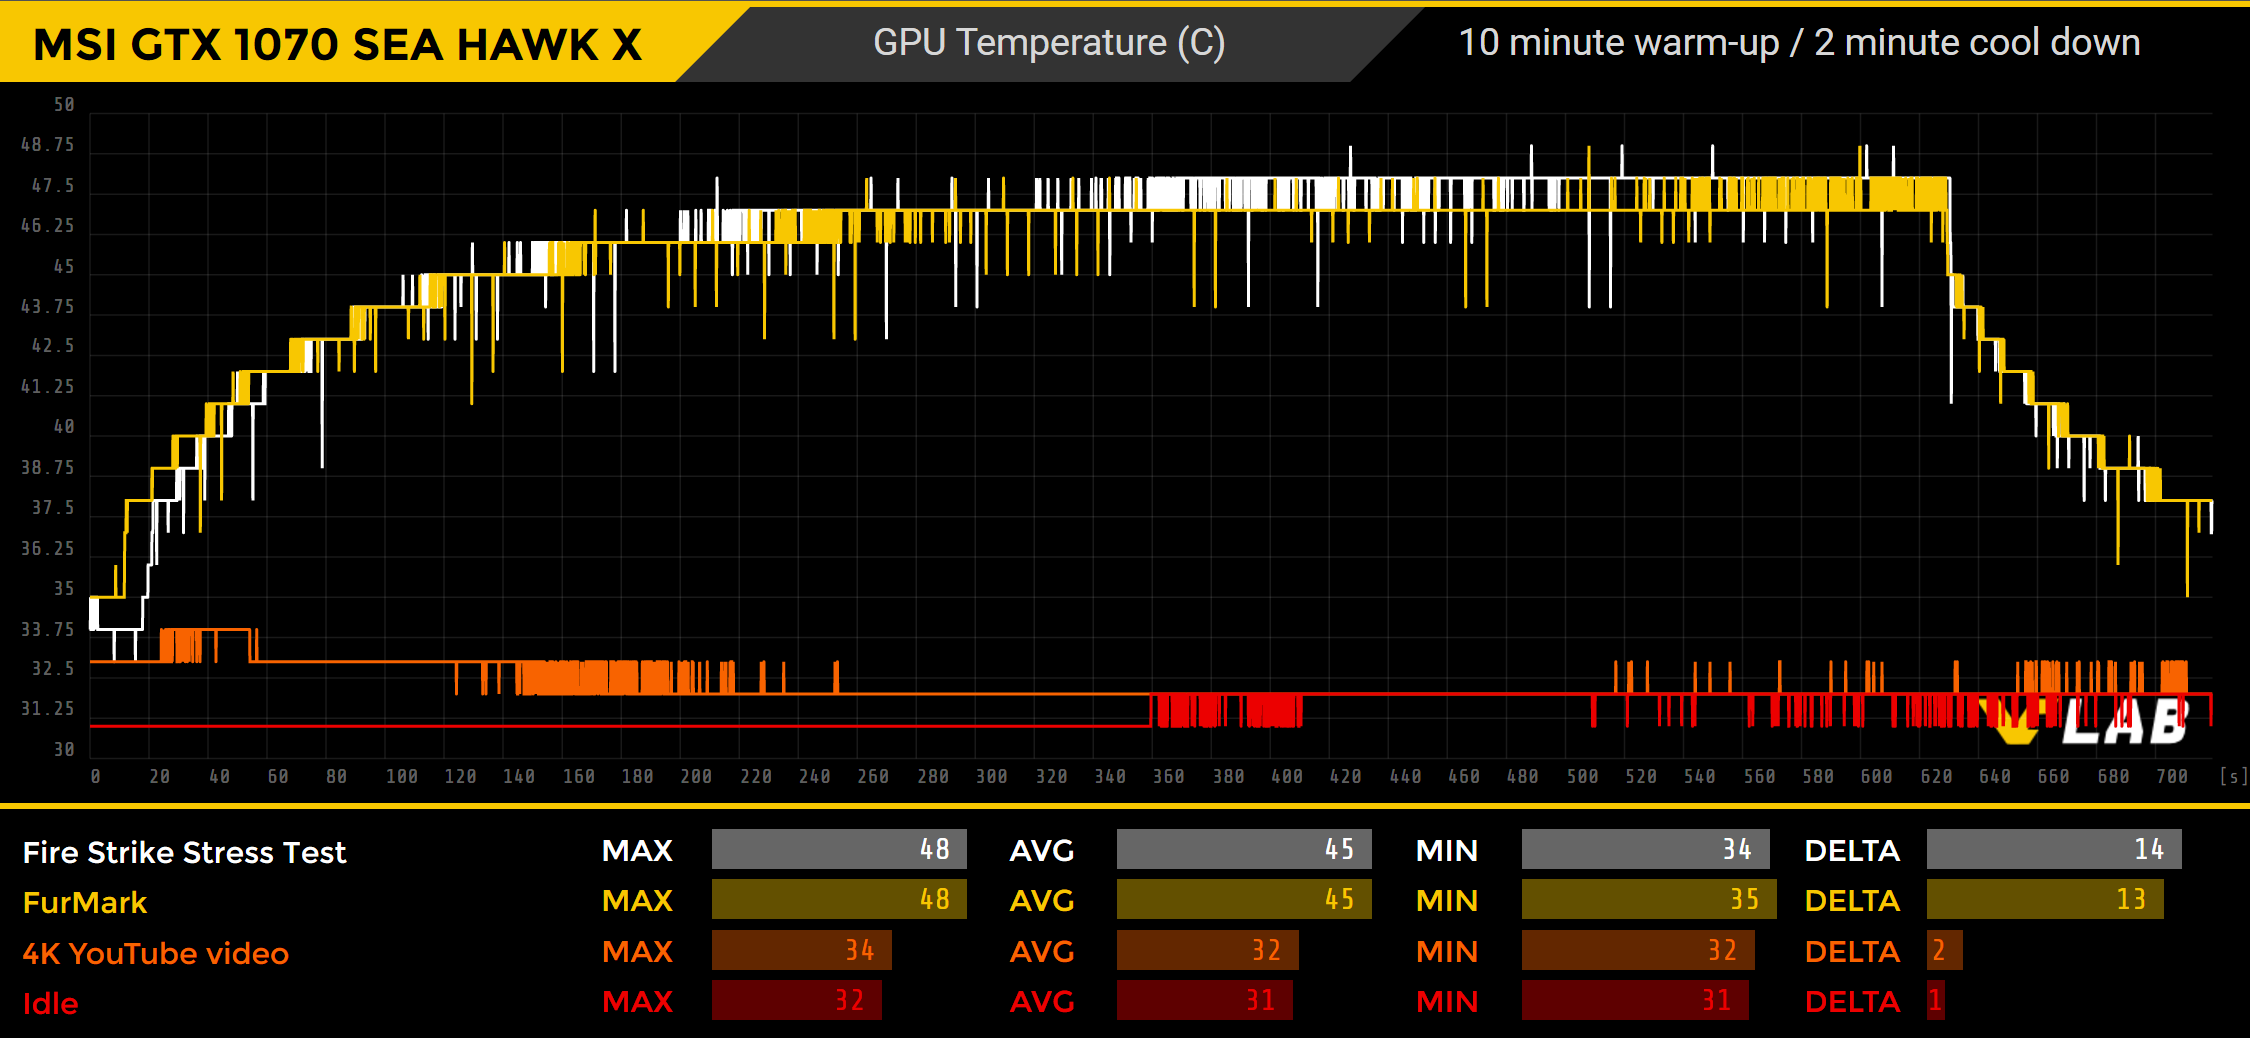 MSI GeForce GTX 1070 SEA HAWK X Review - STABILITY